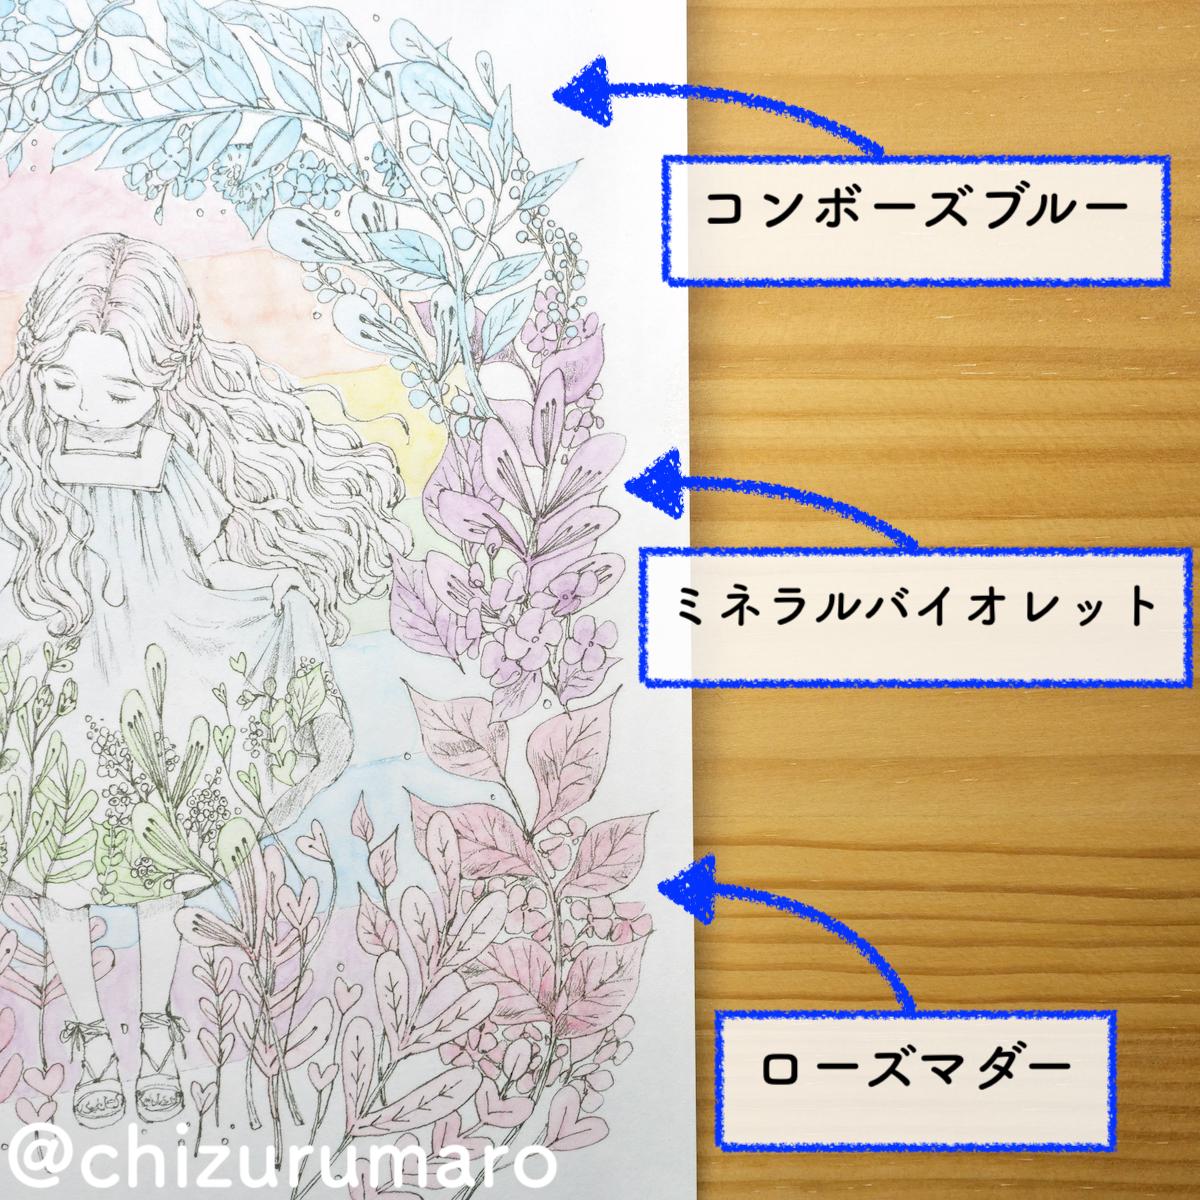 f:id:chizurumaro:20210310220718j:plain